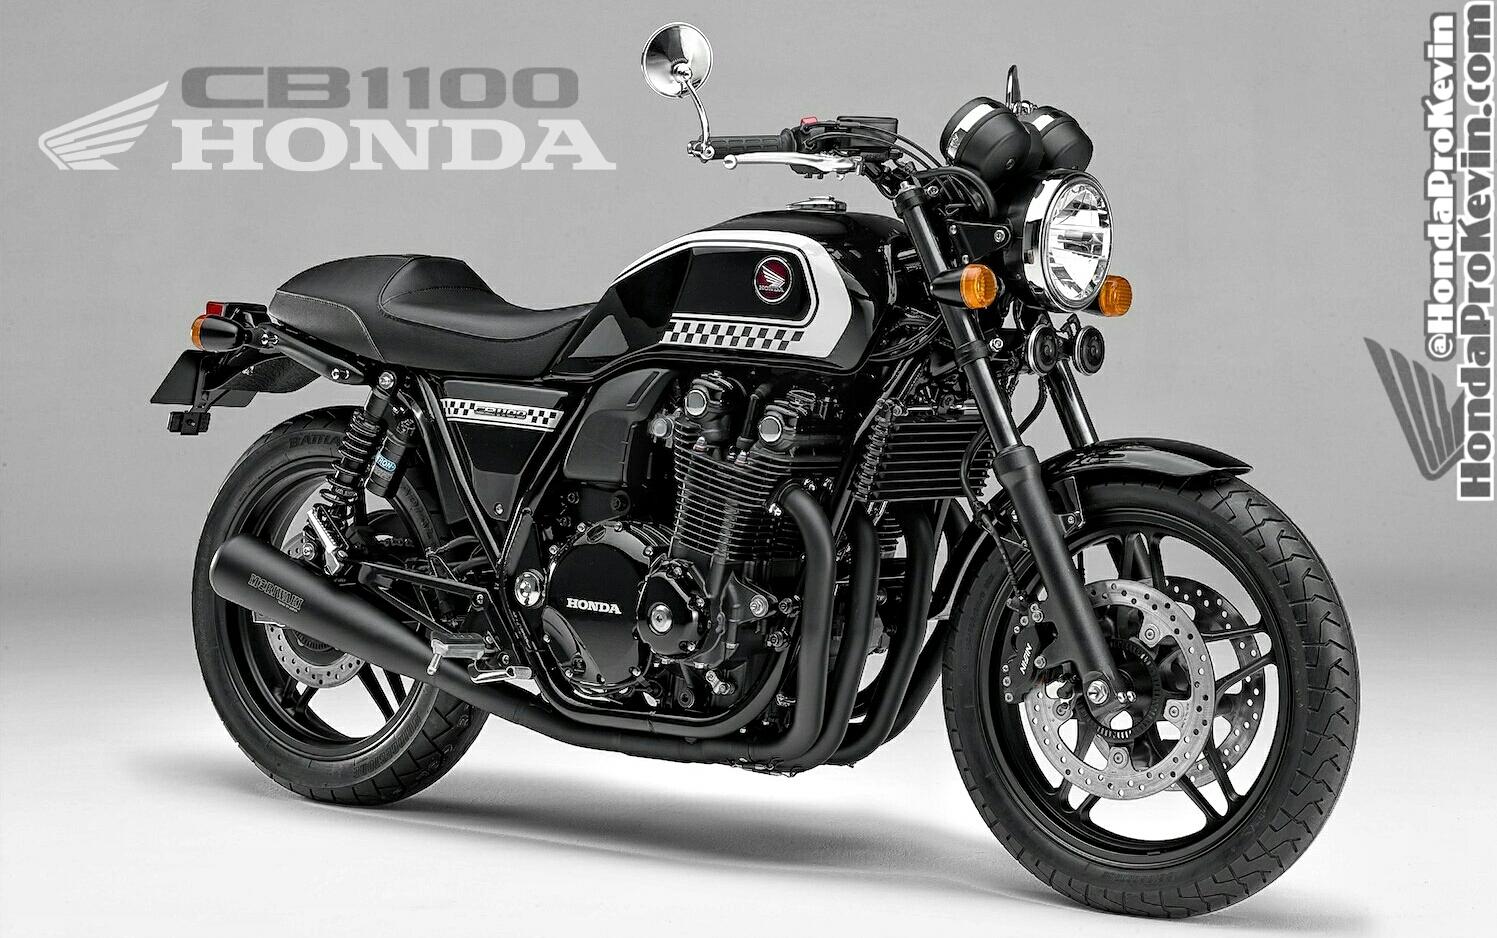 2016 Honda CB1100 Info / Custom Concept Motorcycle - Vintage / Retro Cafe Racer Style Bike | CB1100 EX / Deluxe